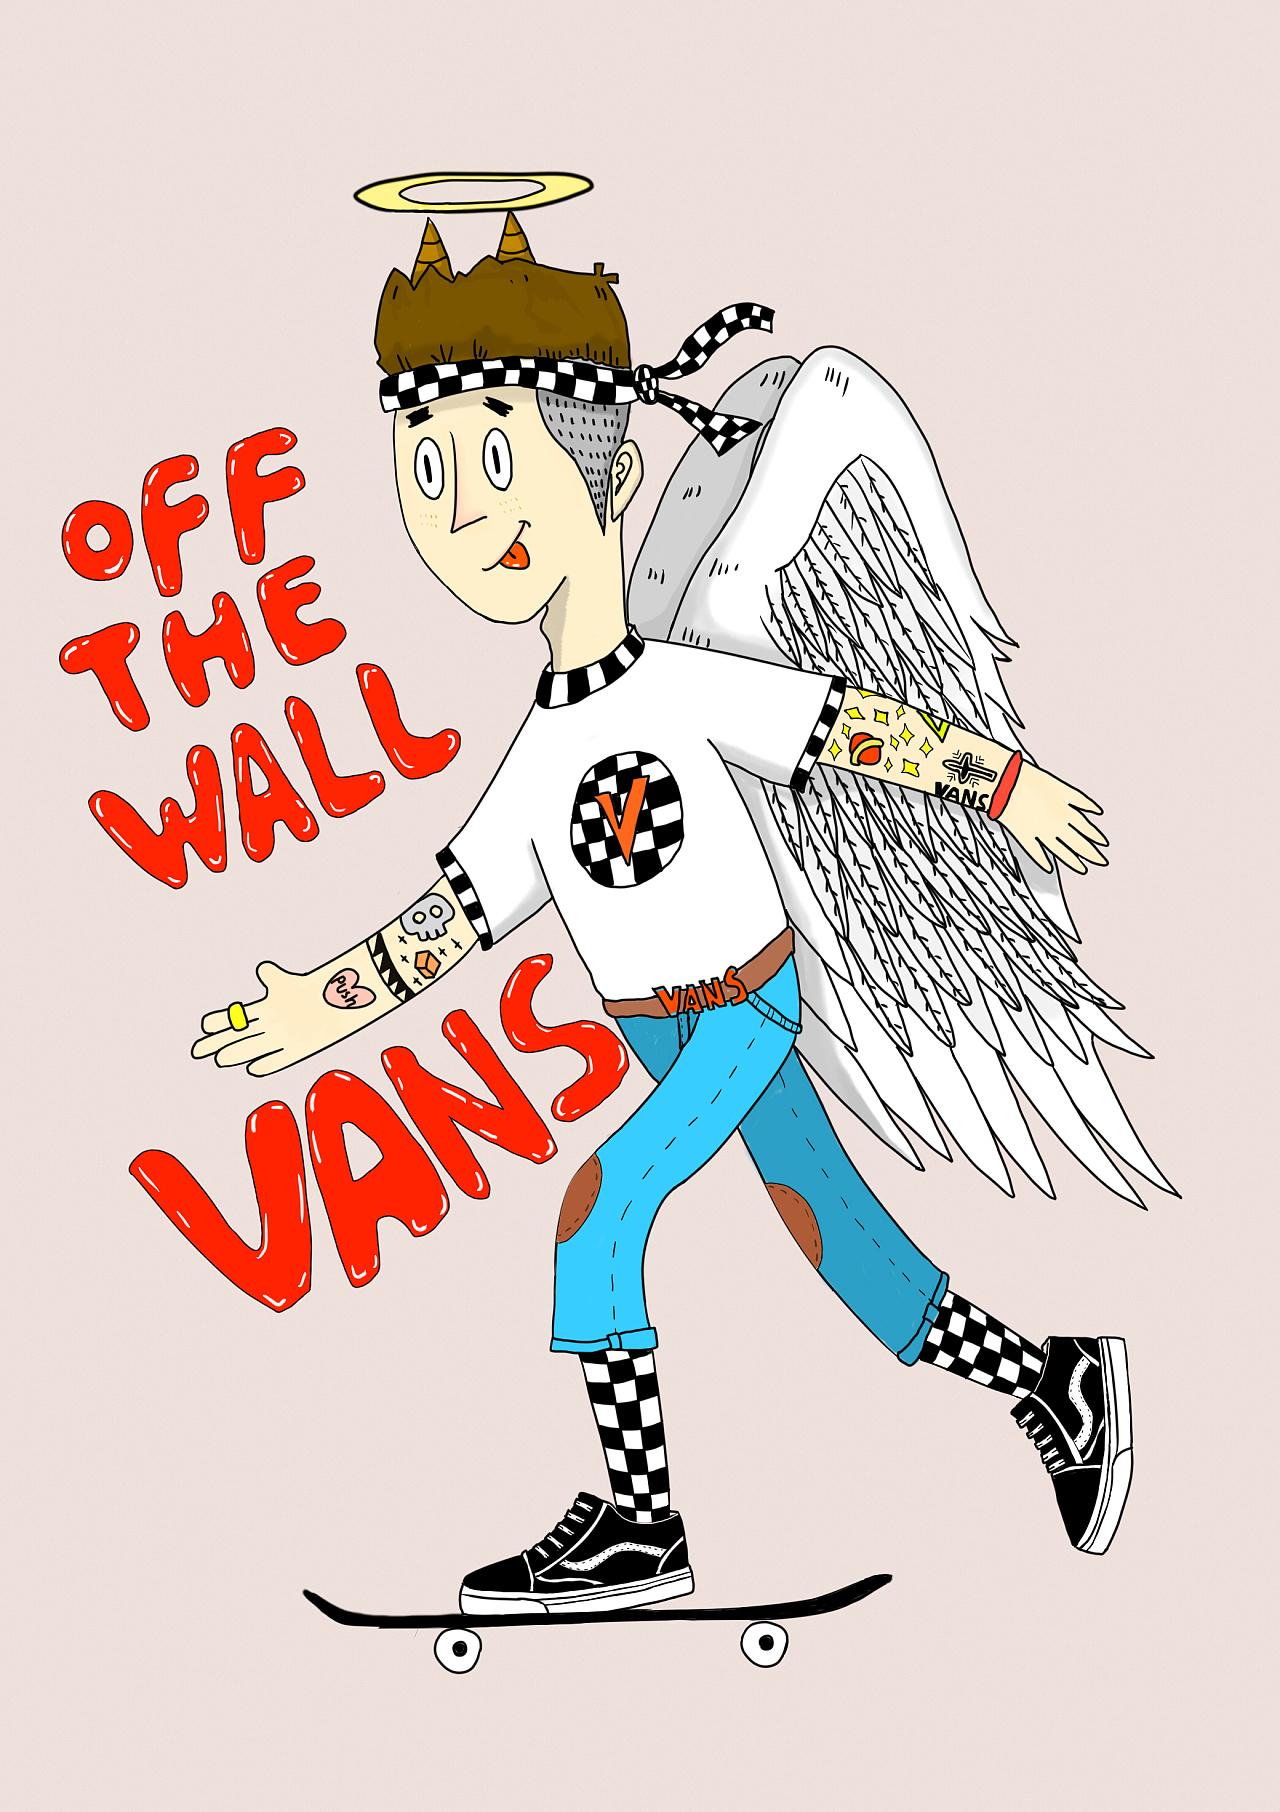 vans卡通手绘